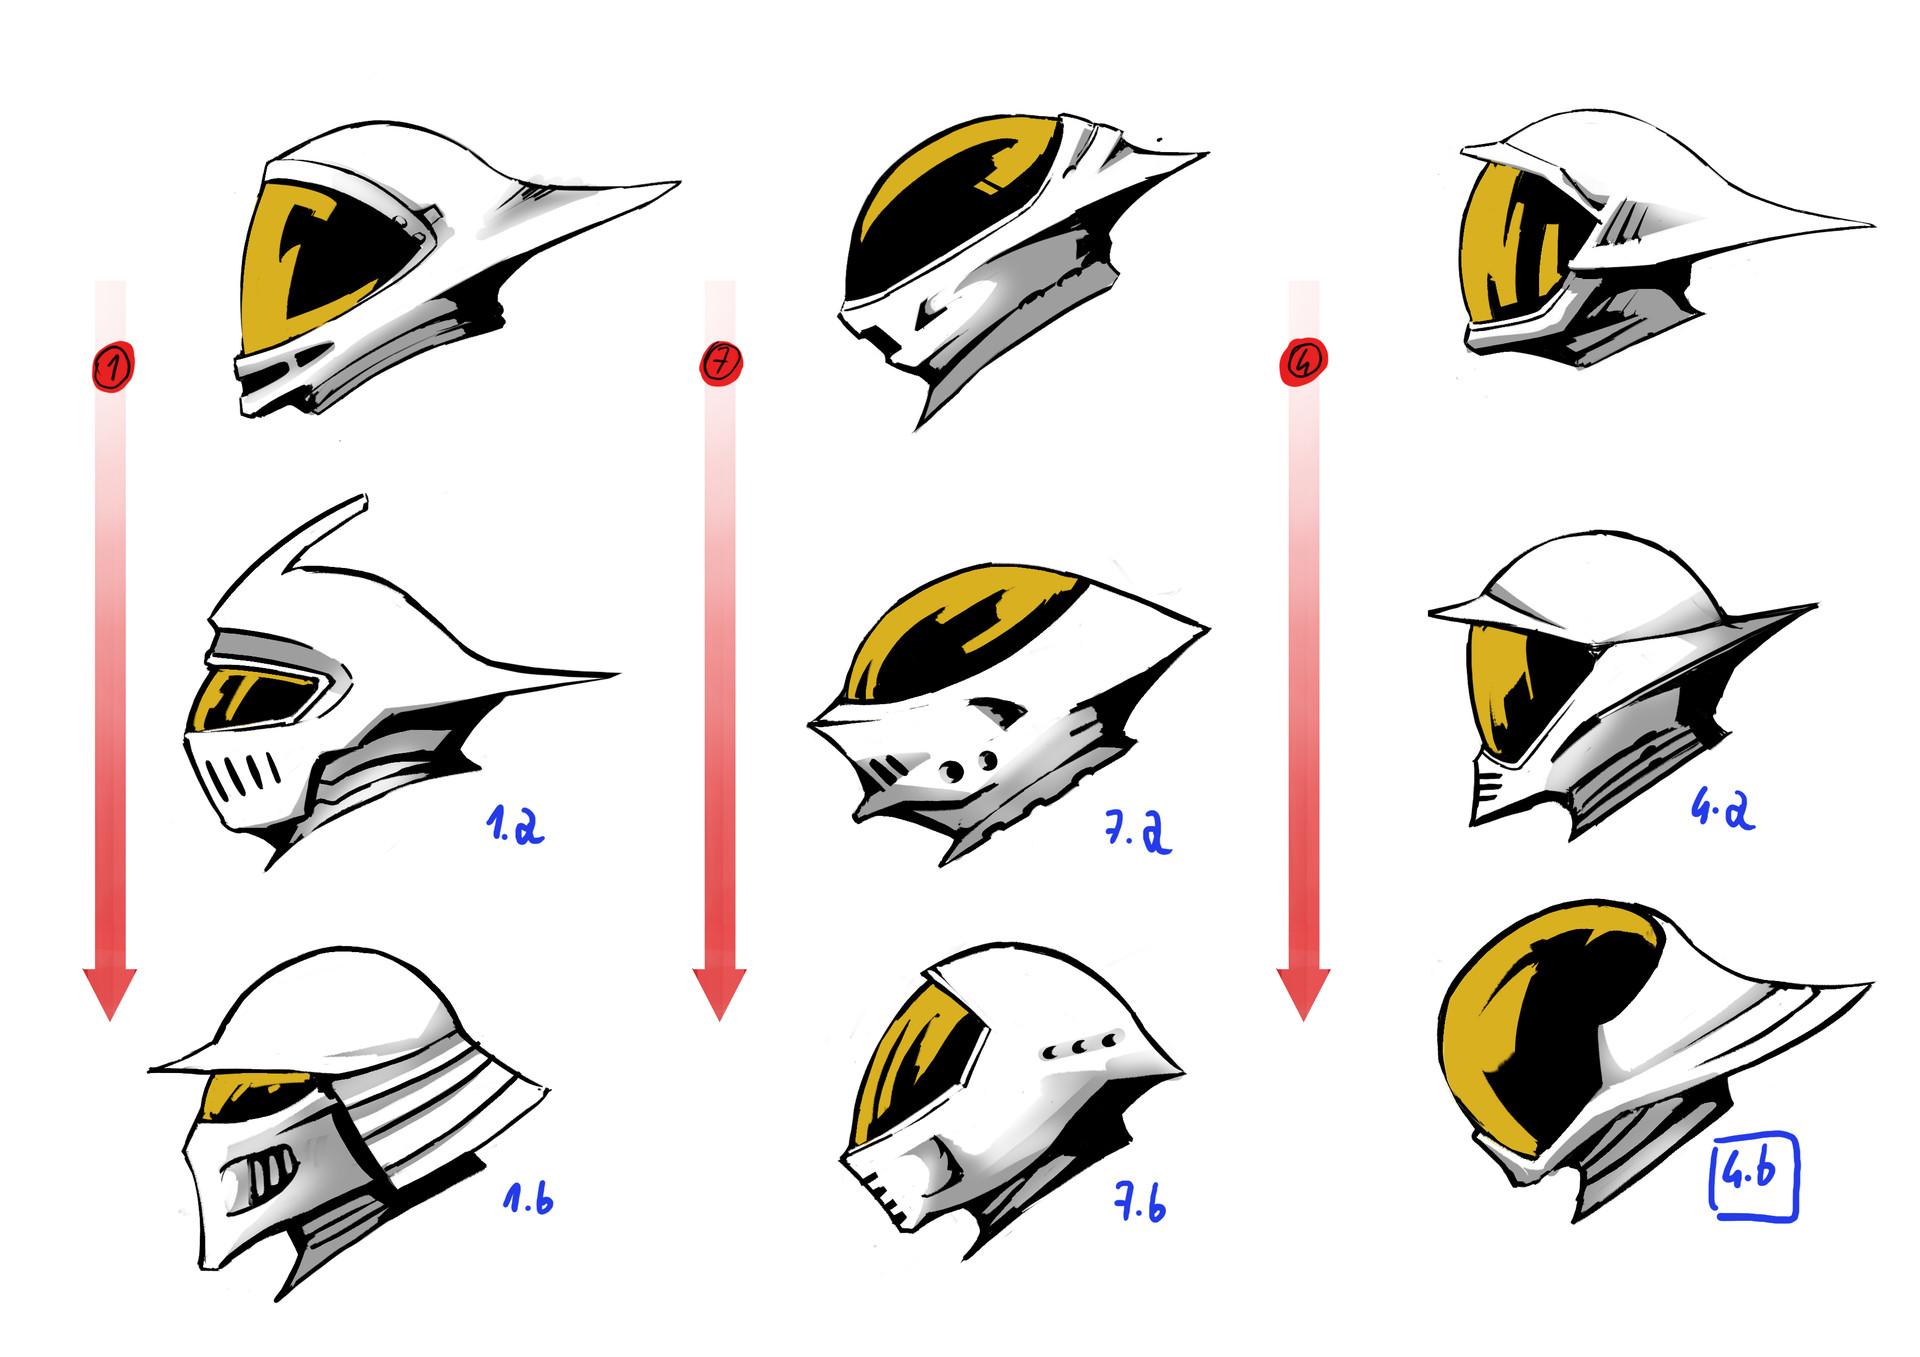 Vincenzo lamolinara helmet2